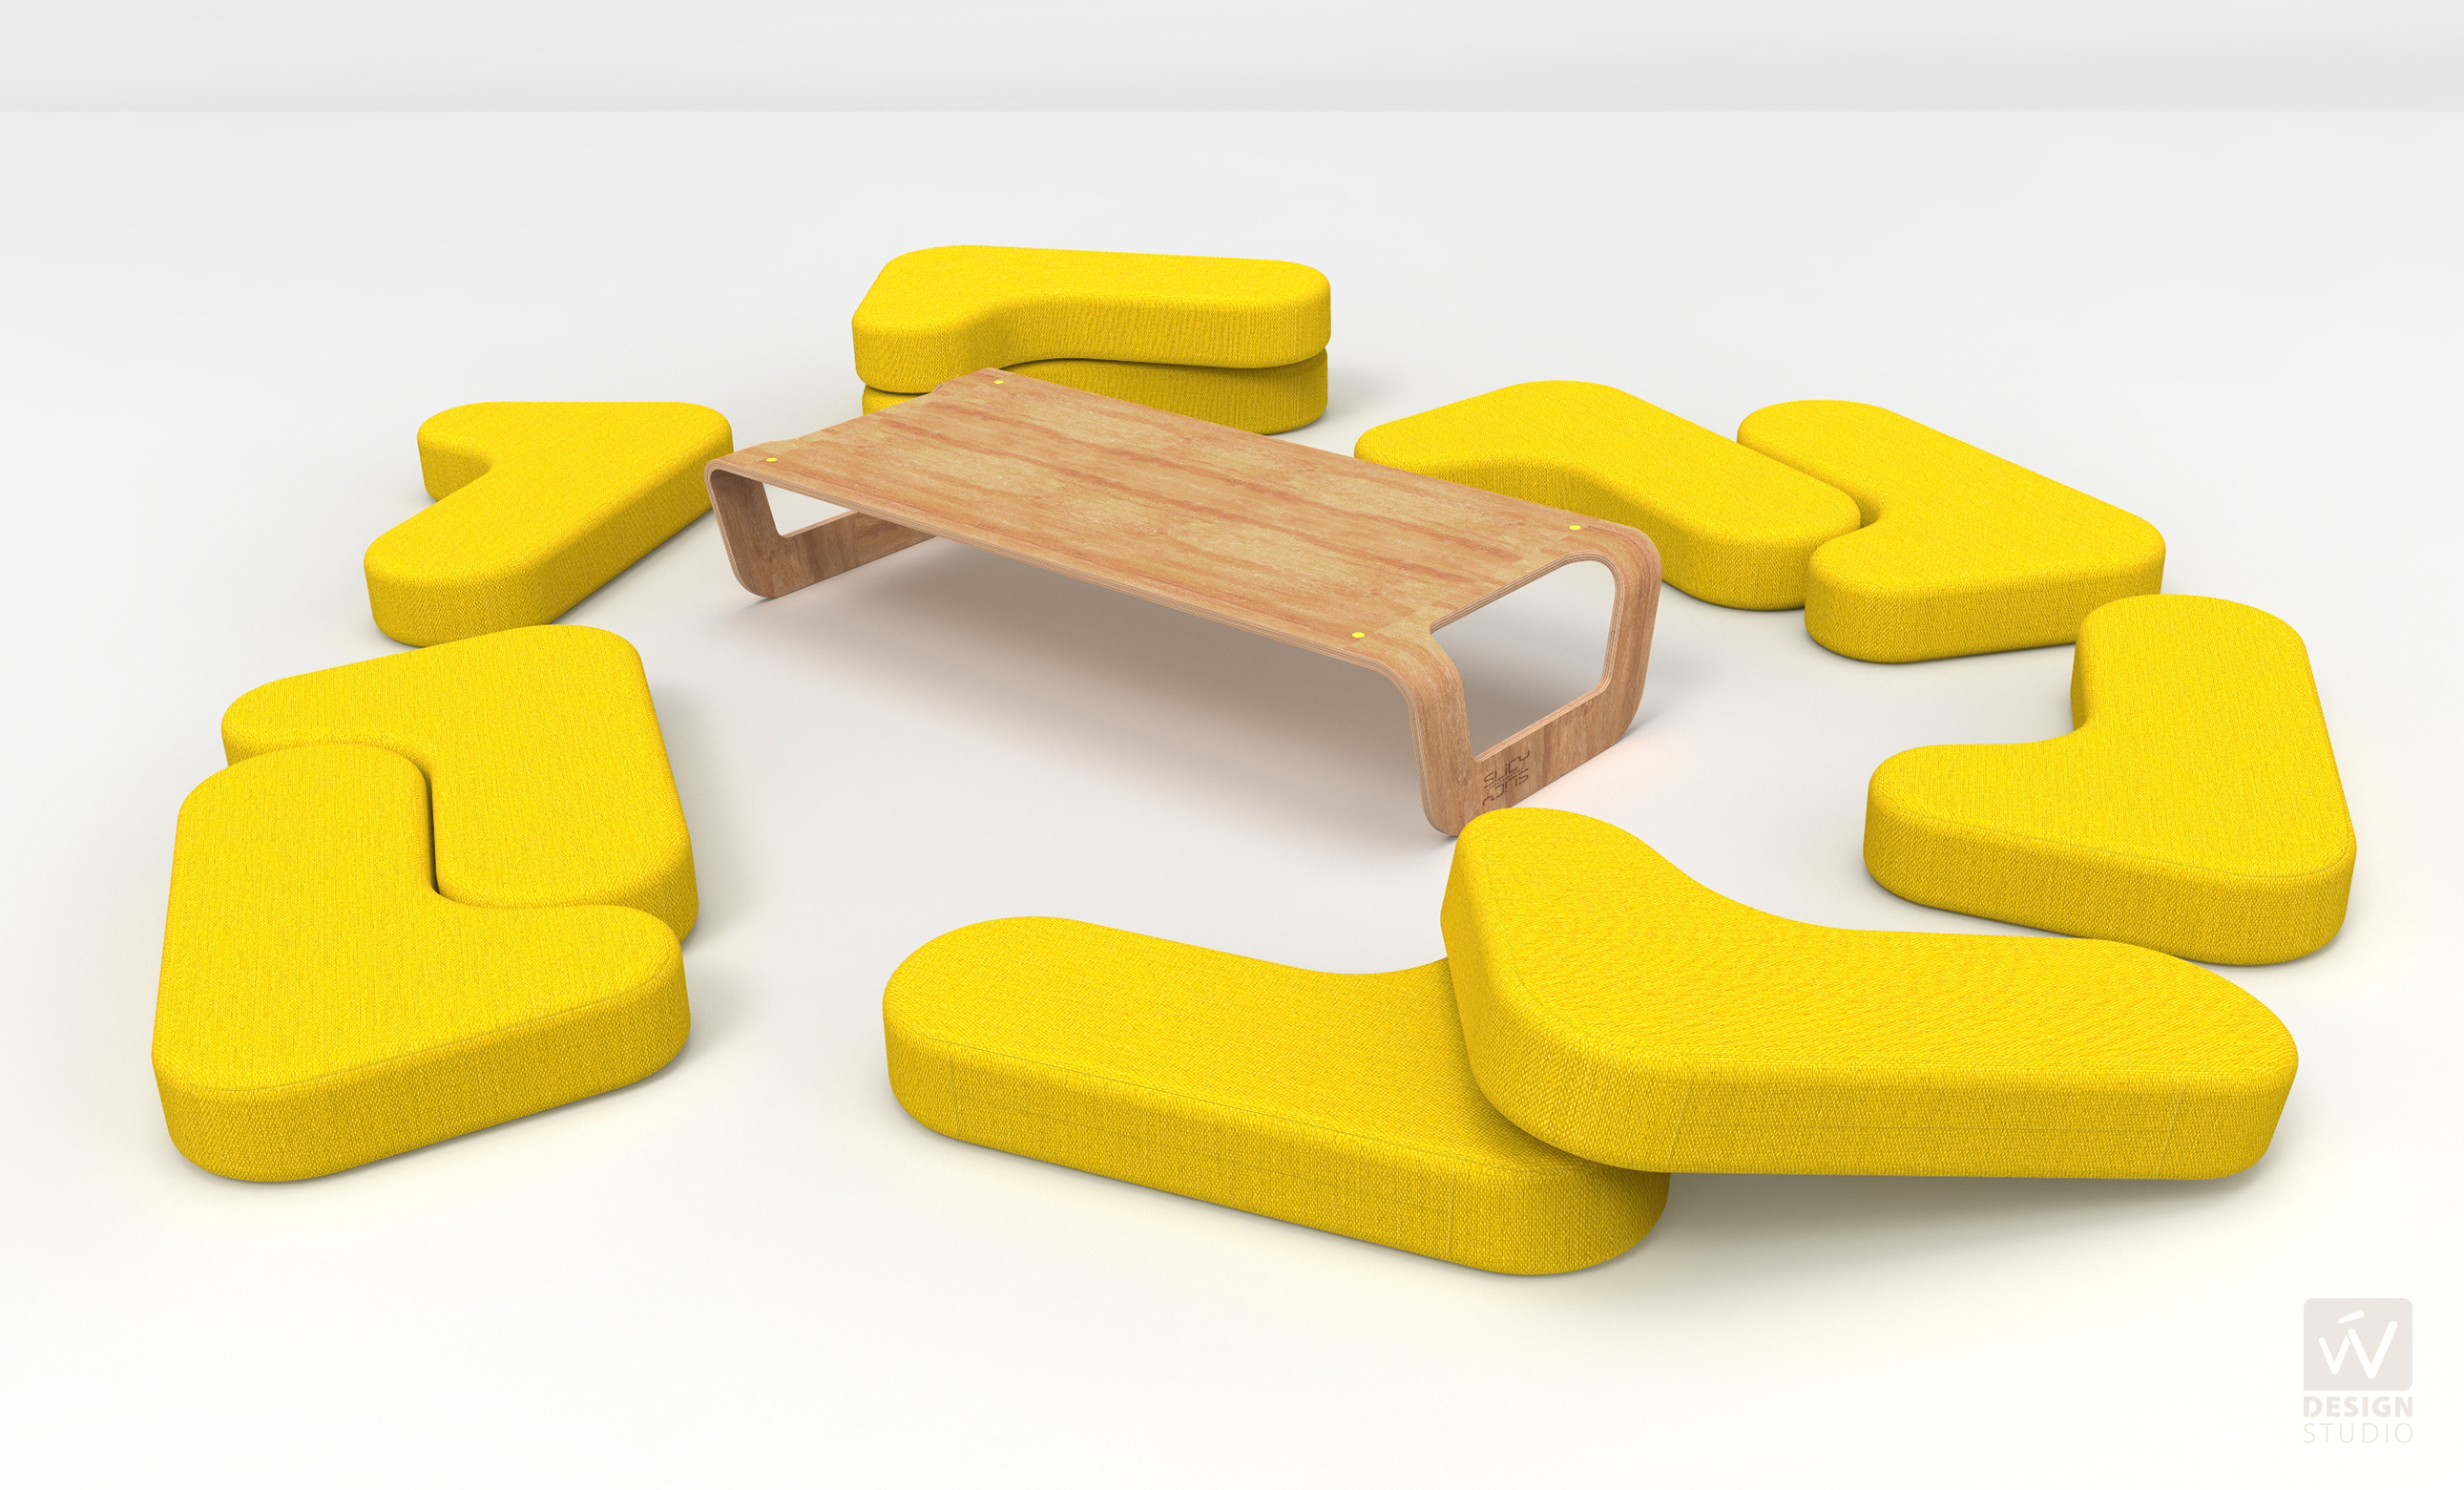 vincent-vedie-product-designer-scene_canape_deploye